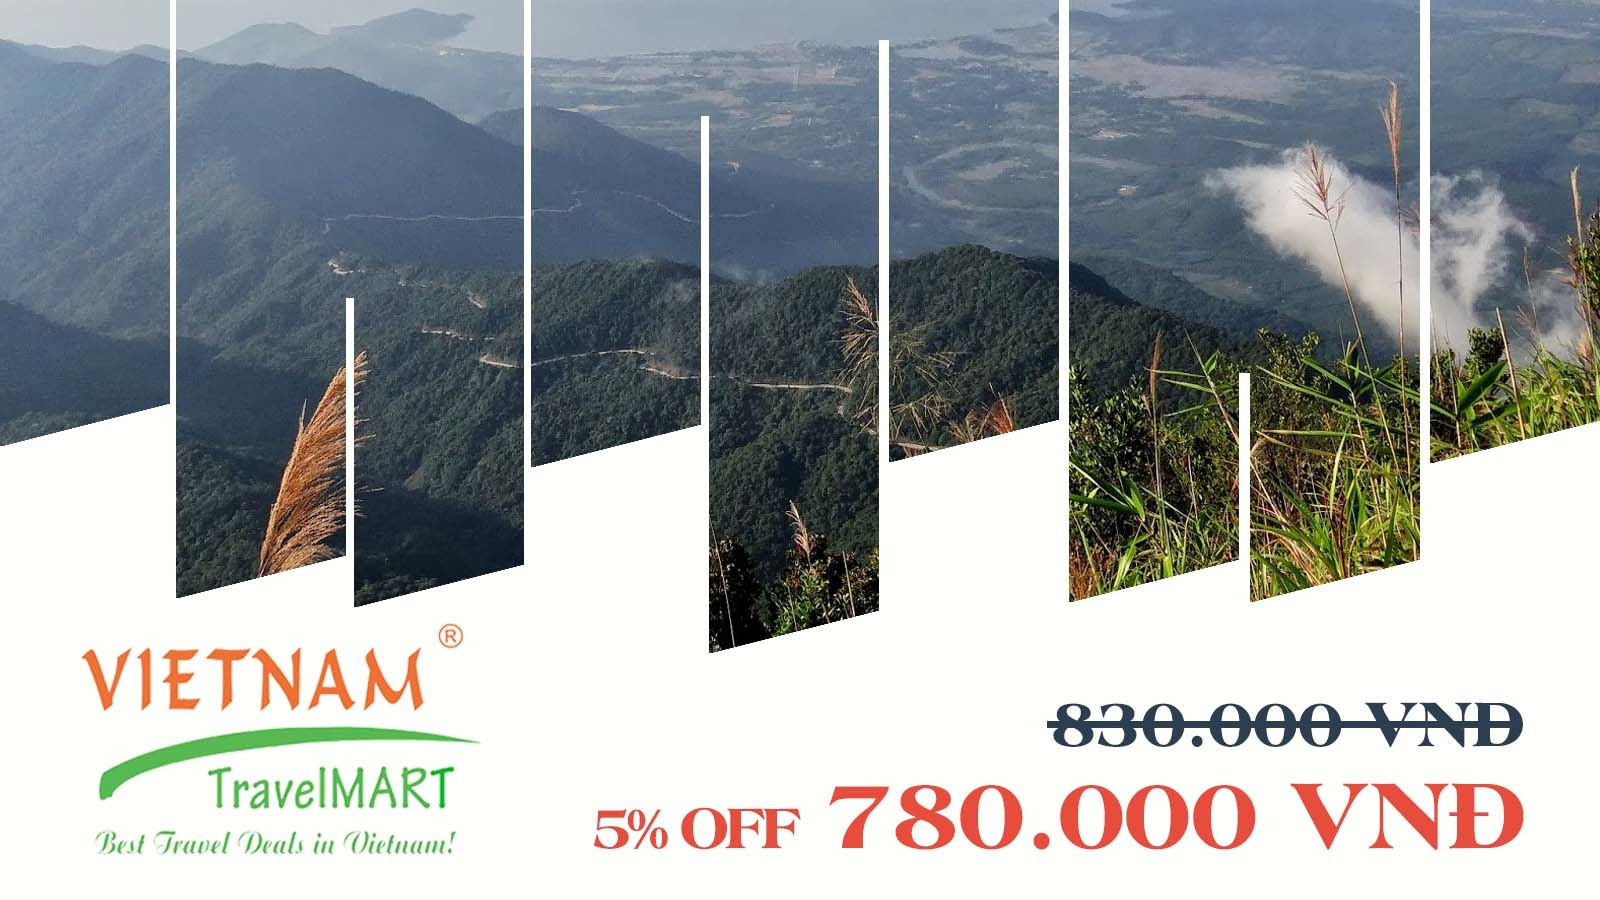 VIETNAM TRAVELMART JSC | 5% OFF BACH MA NATIONAL PARK DAILY TOUR